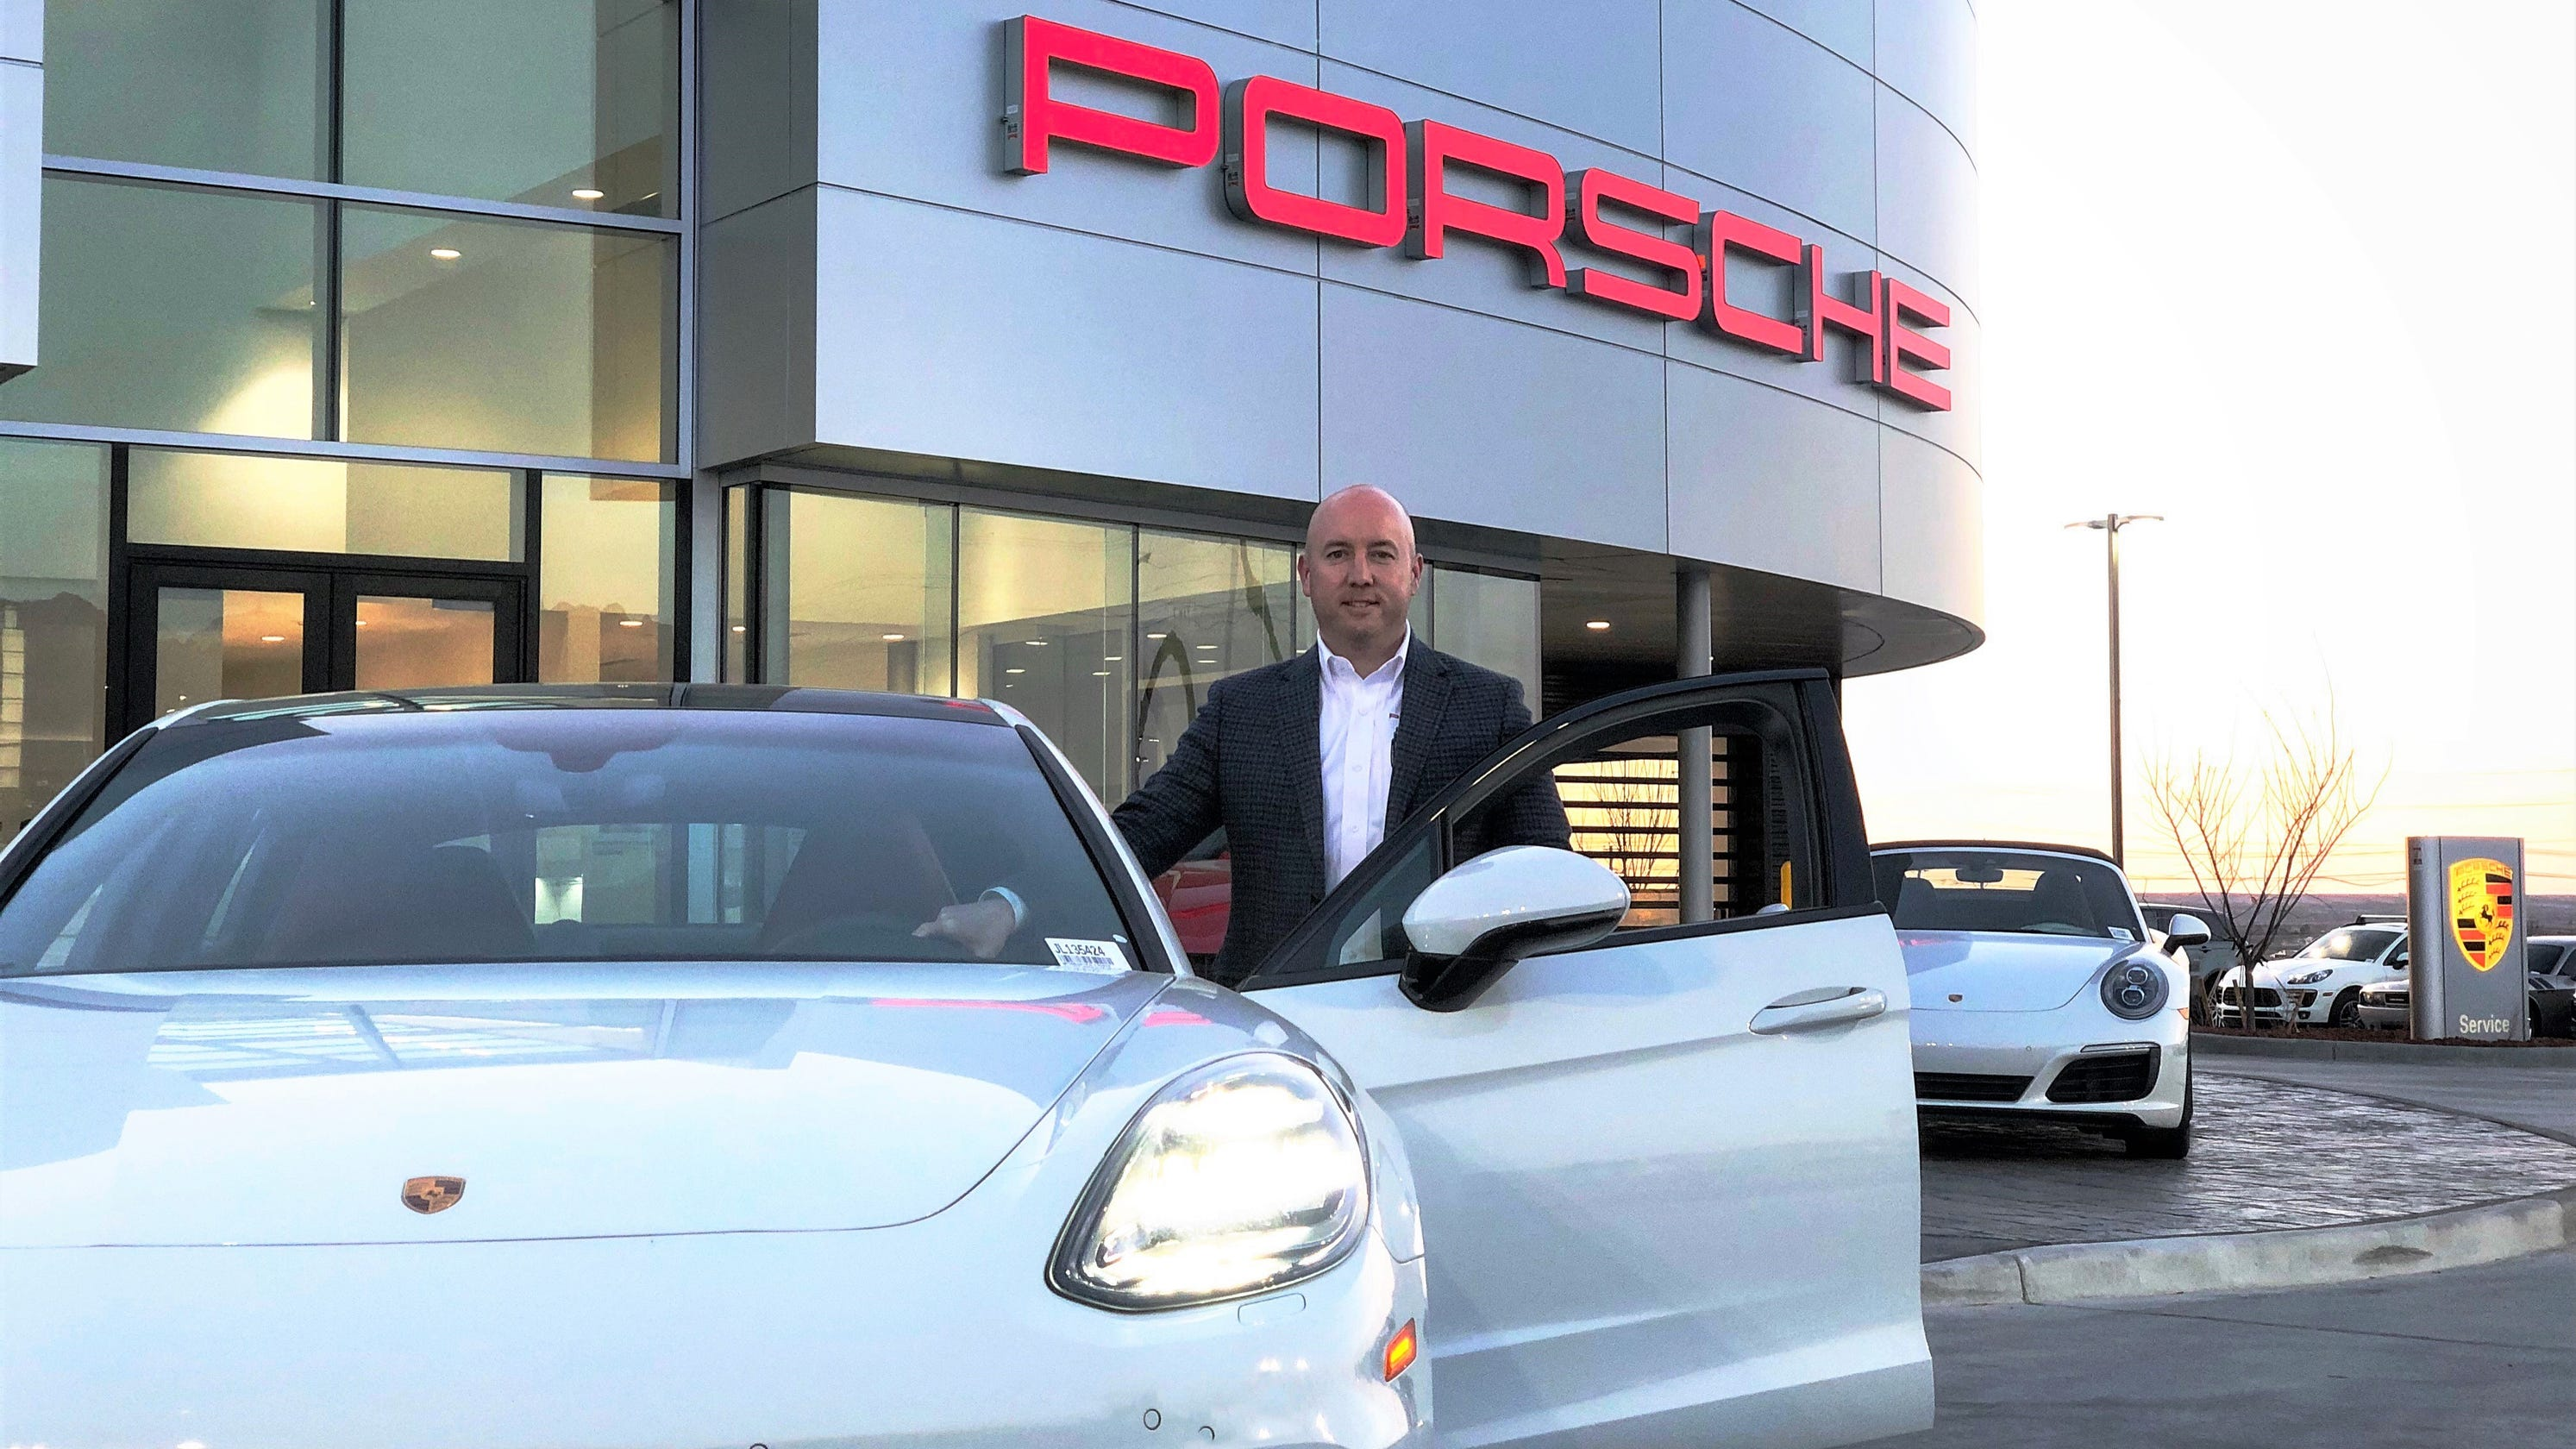 Porsche Dealership Opens In El Paso New Volvo On The Way